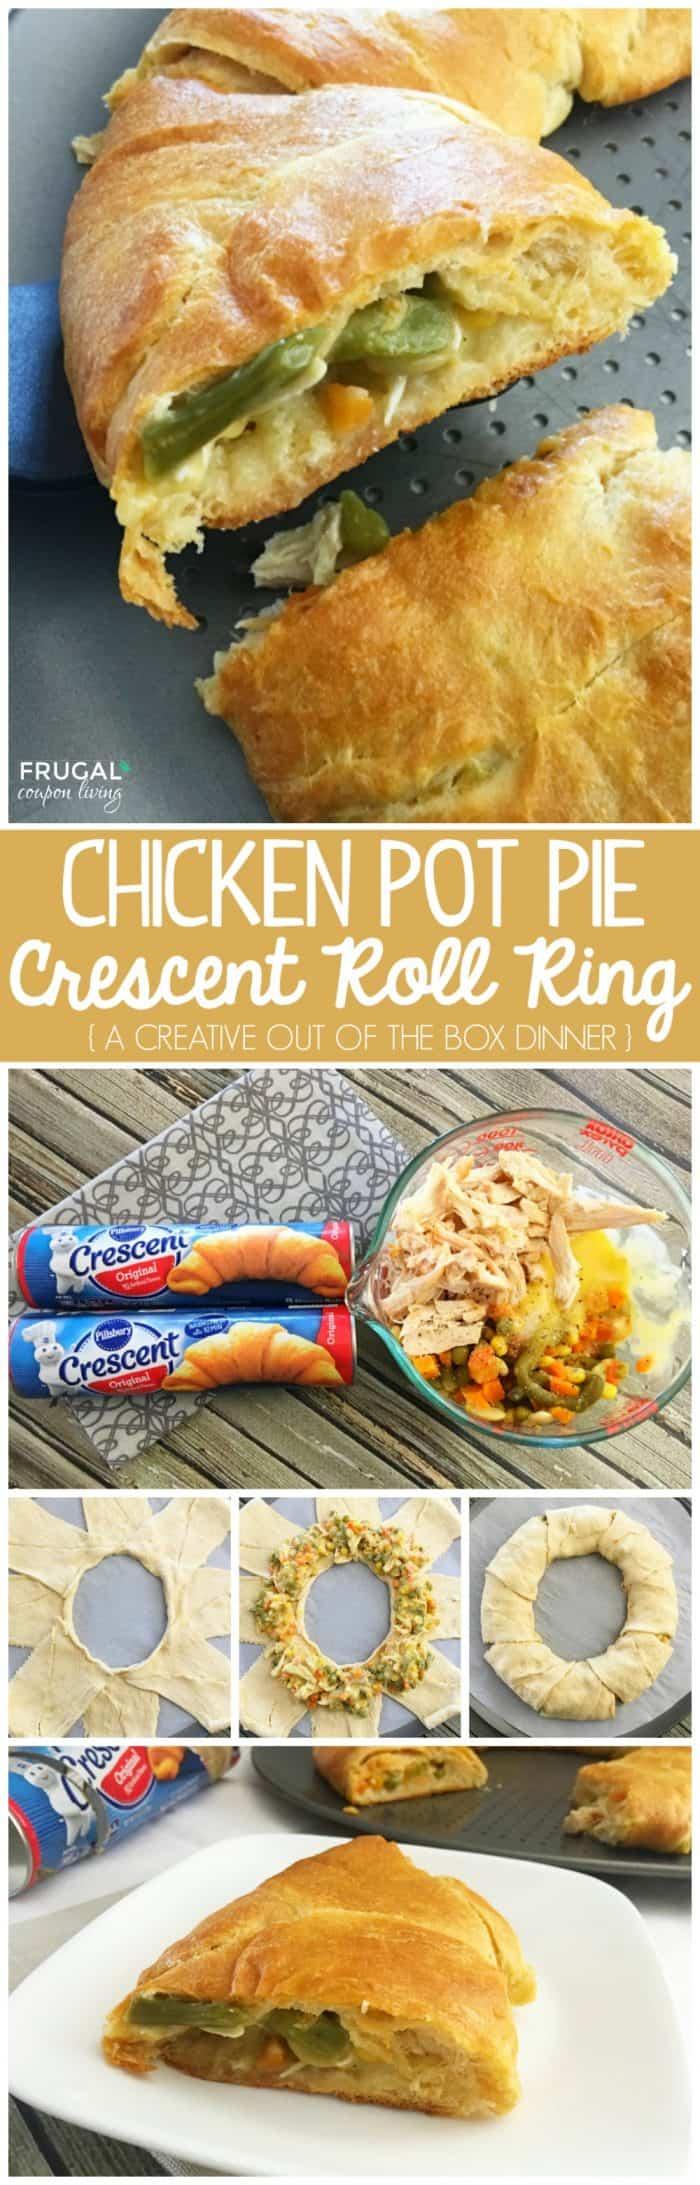 Pillsbury Chicken Pot Pie Crescent Roll Ring